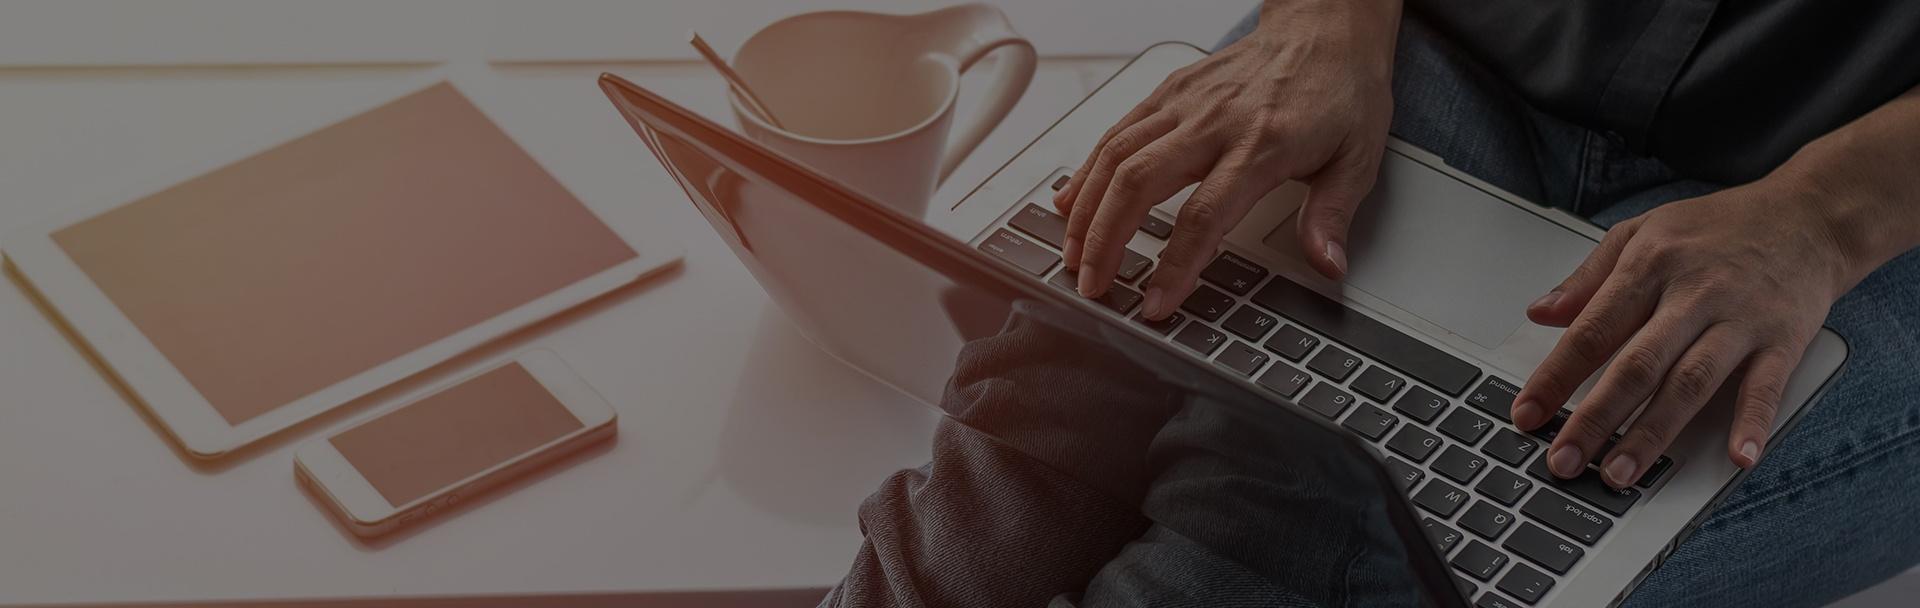 solucionweb-banner-blog-blogging.jpg